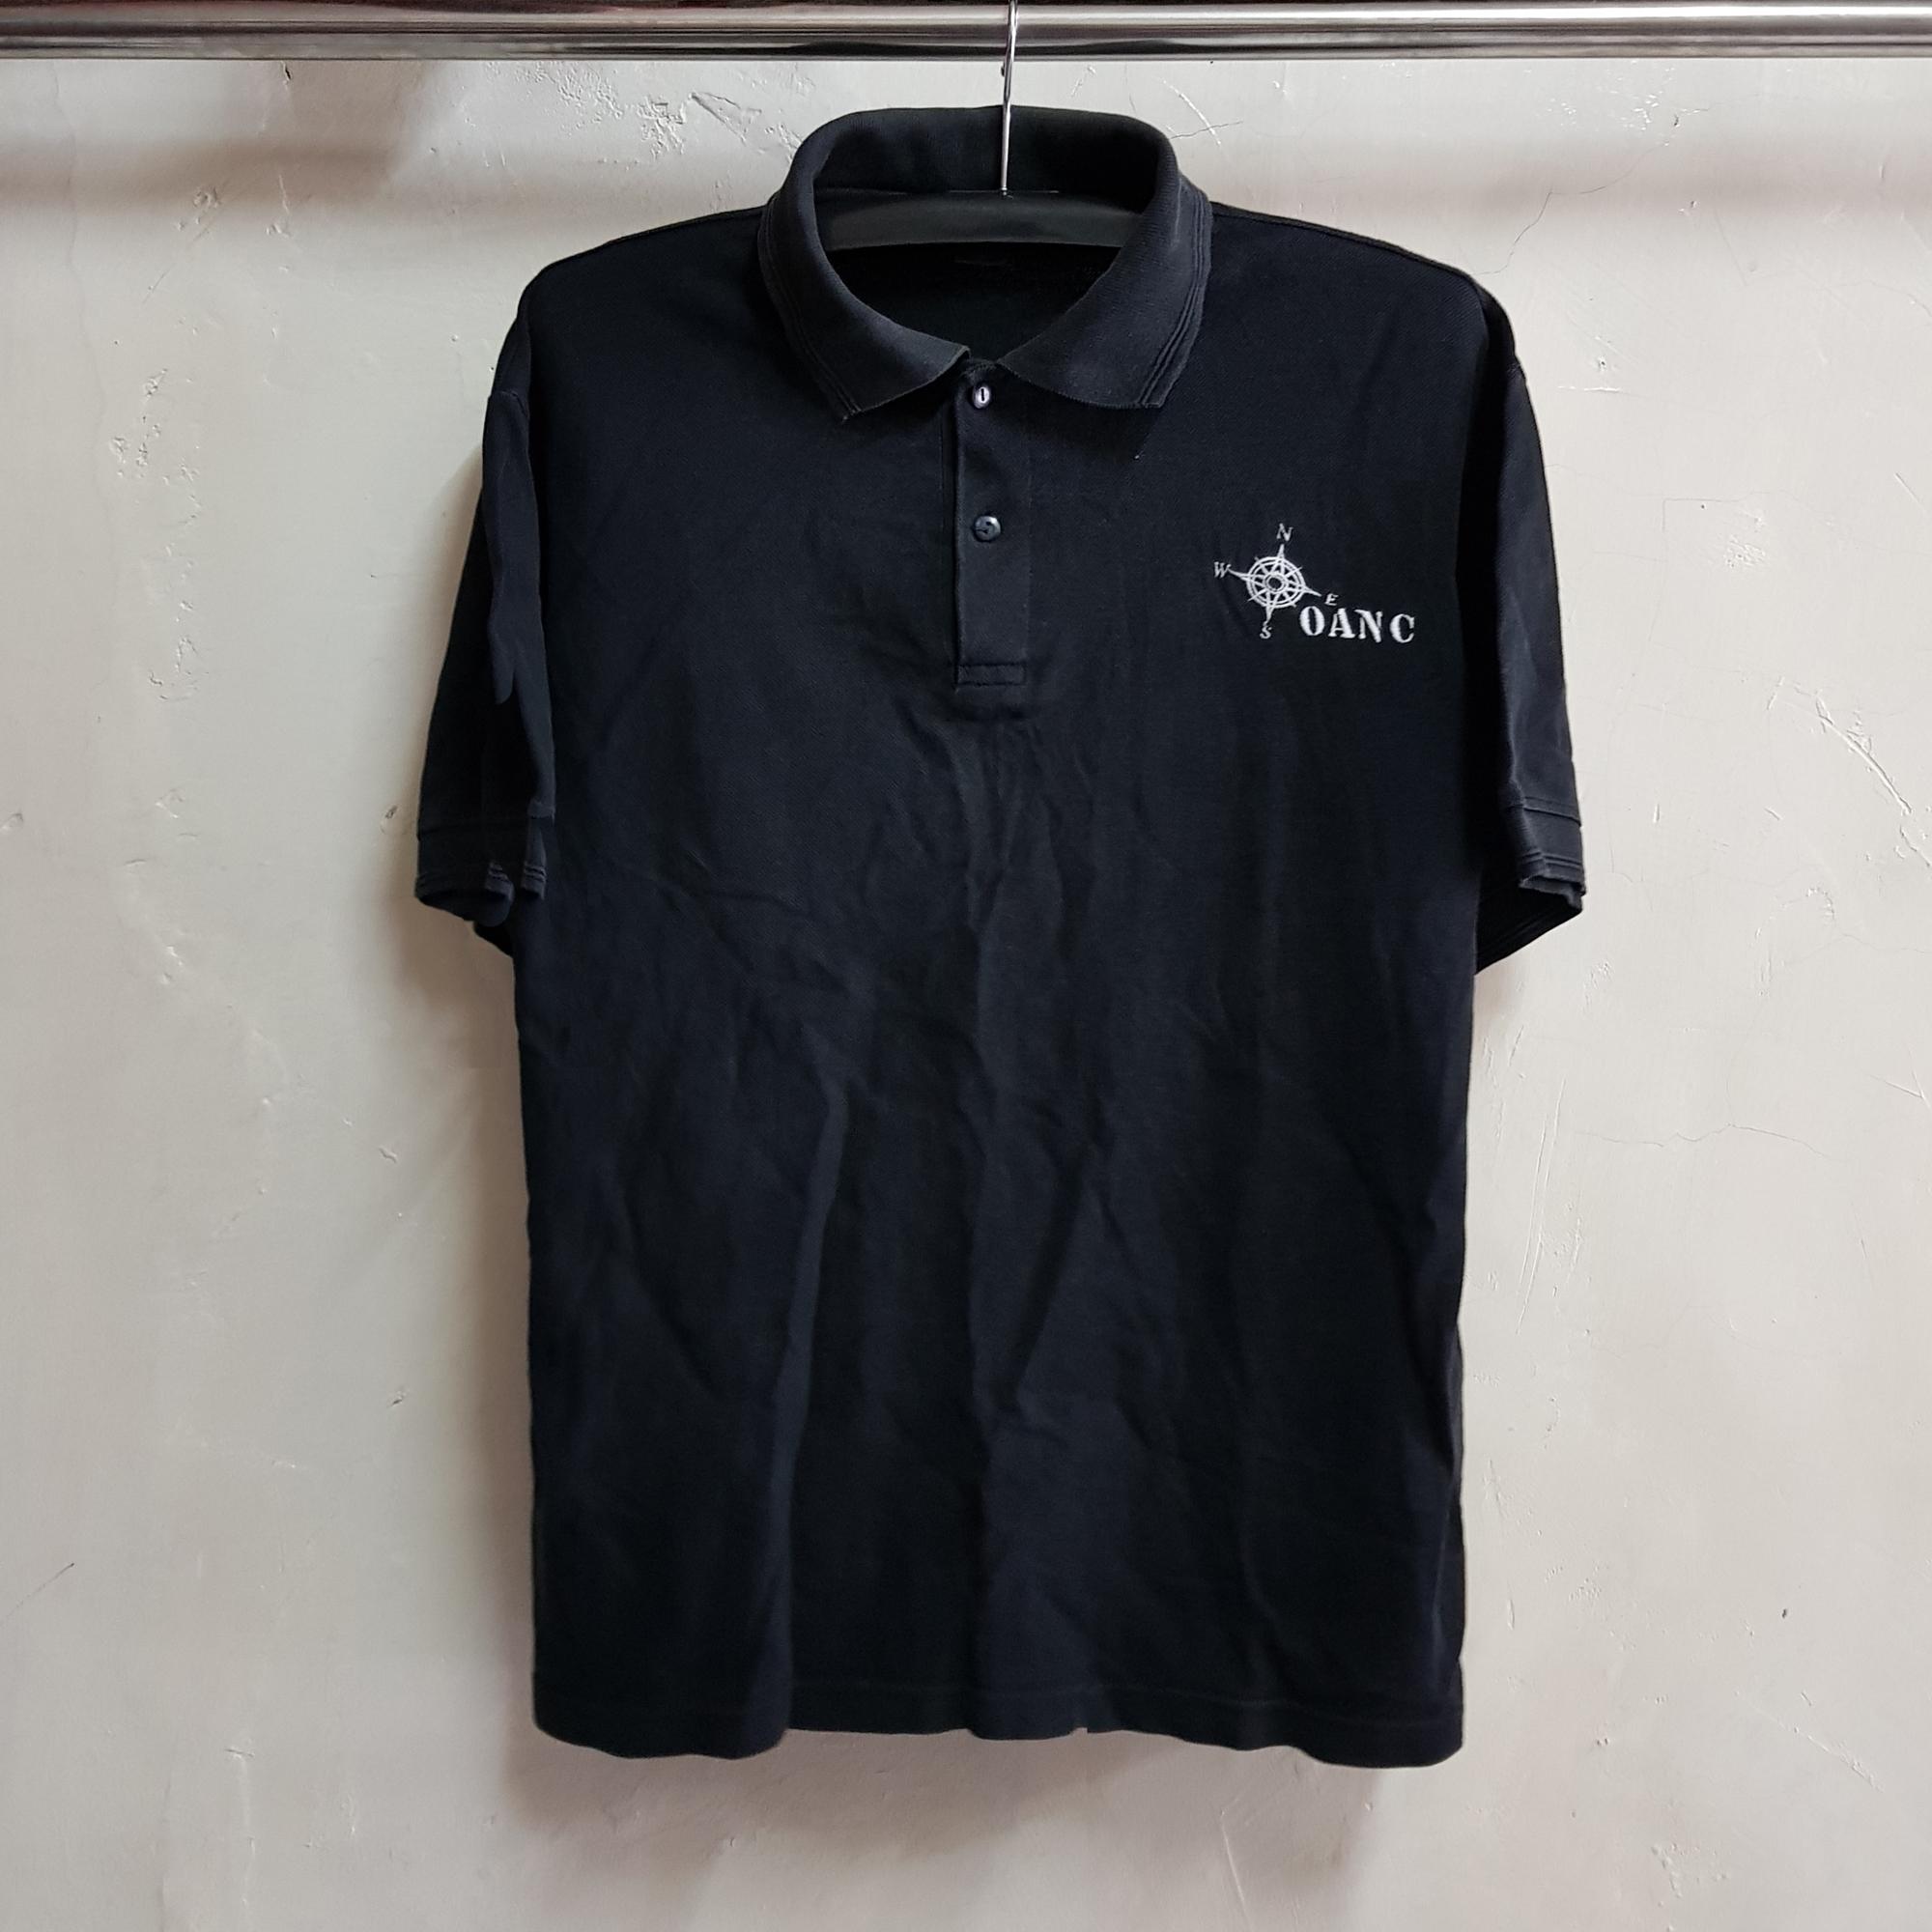 Seragam Poloshirt Lacoste Cotton, OANC